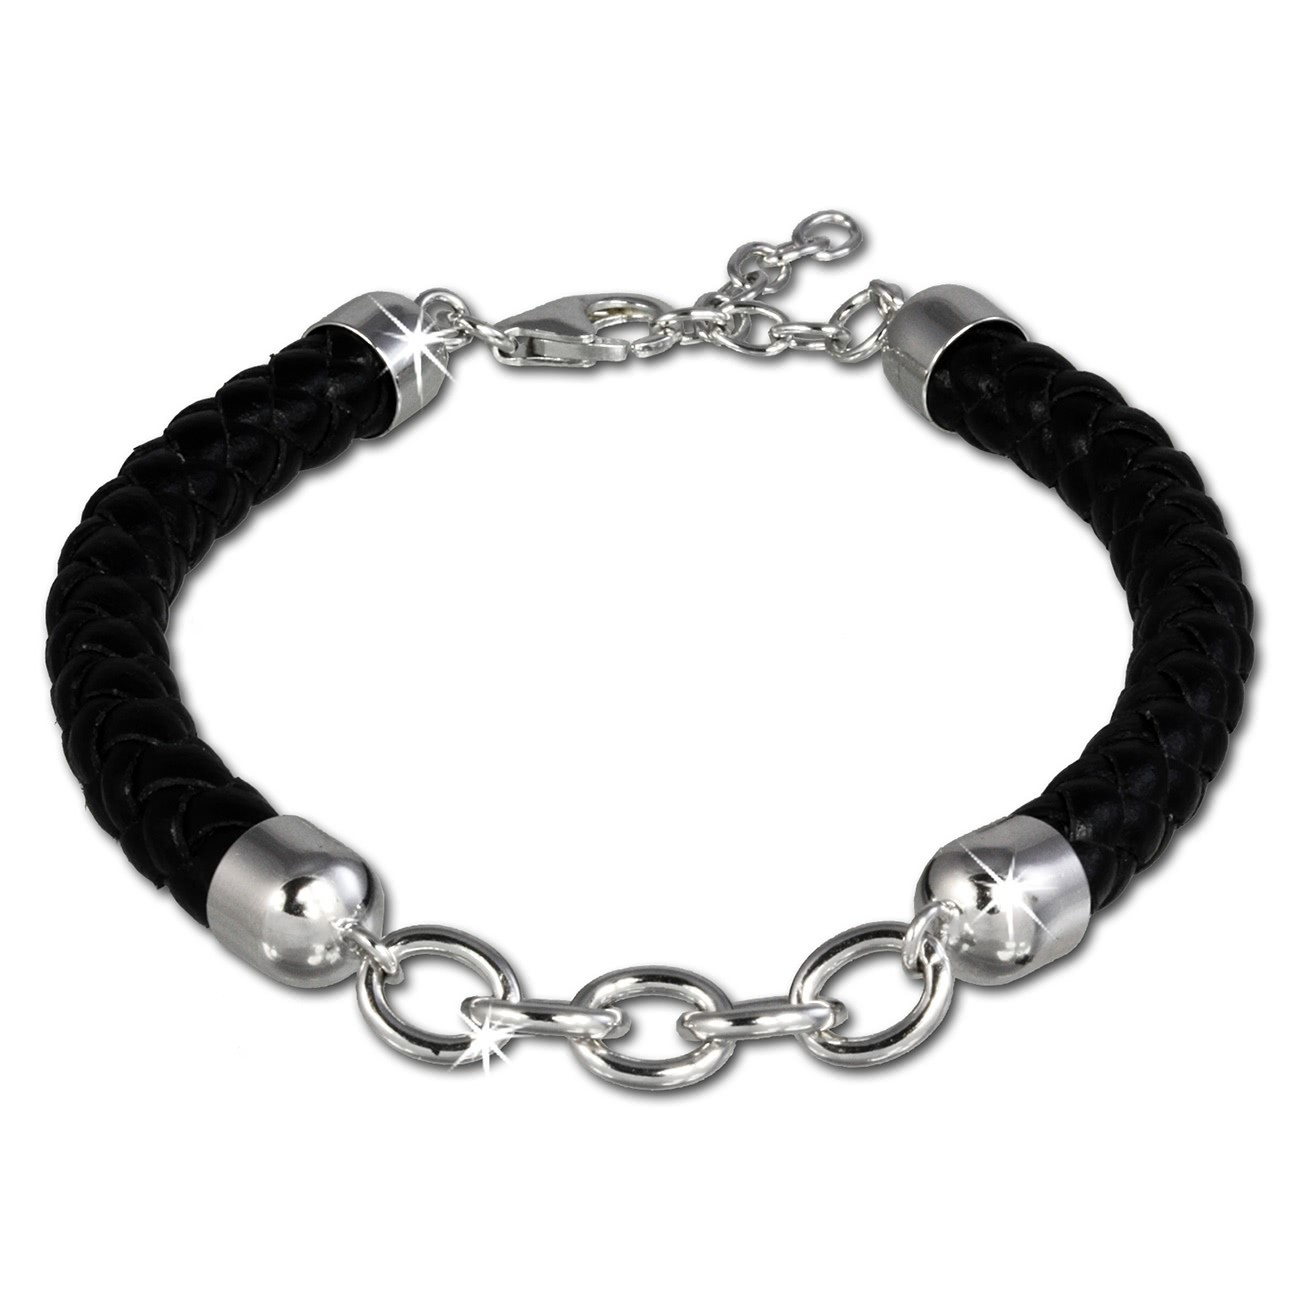 SilberDream Lederarmband schwarz für Charms 925 Silber Armband FC0032